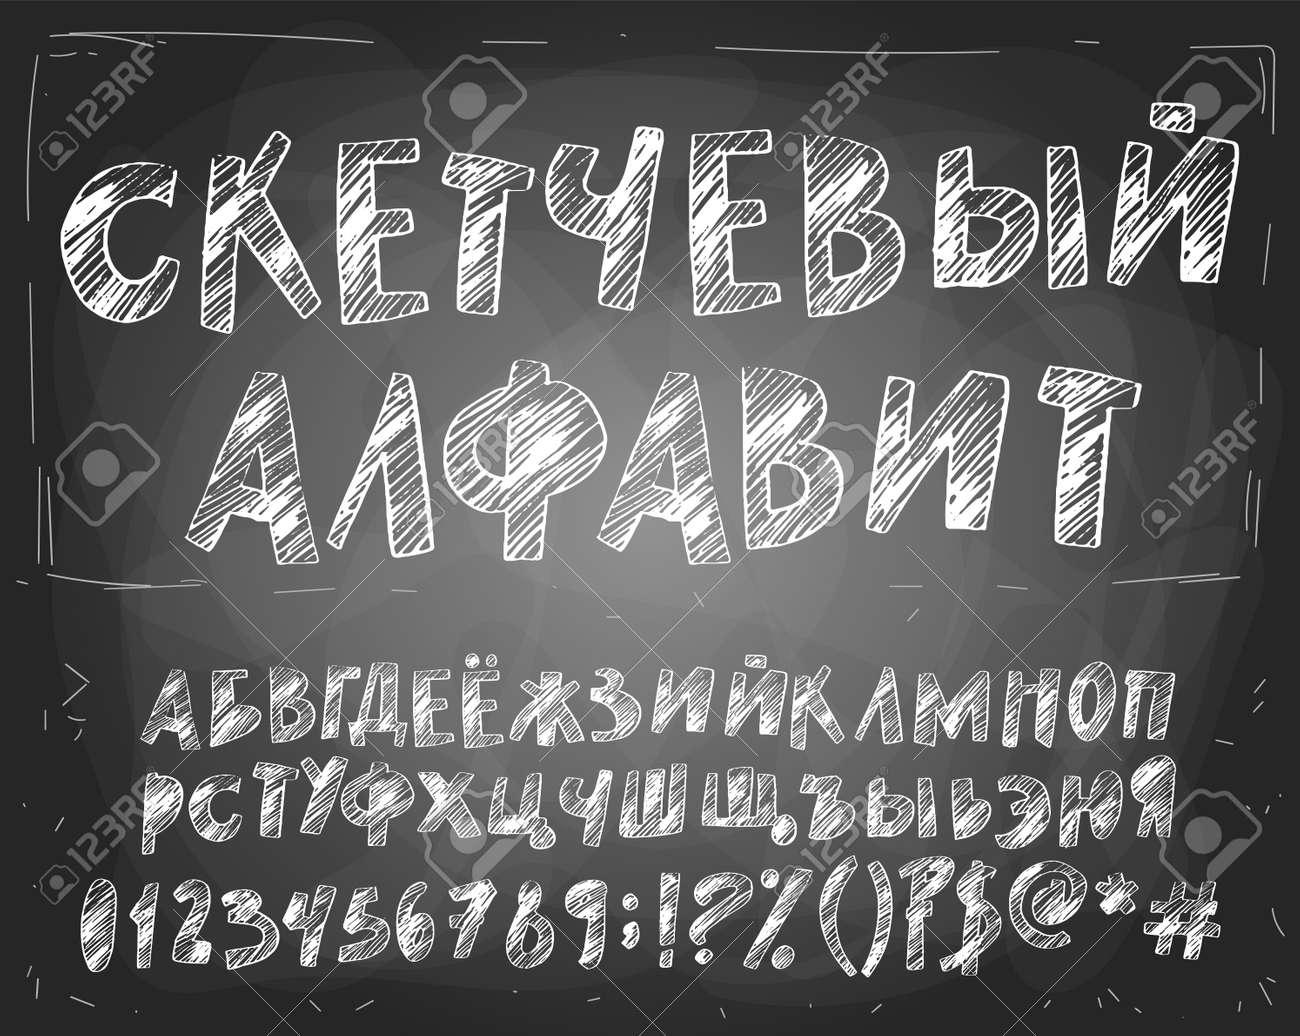 Russian cyrillic alphabet a sketchy vector design - 169375158